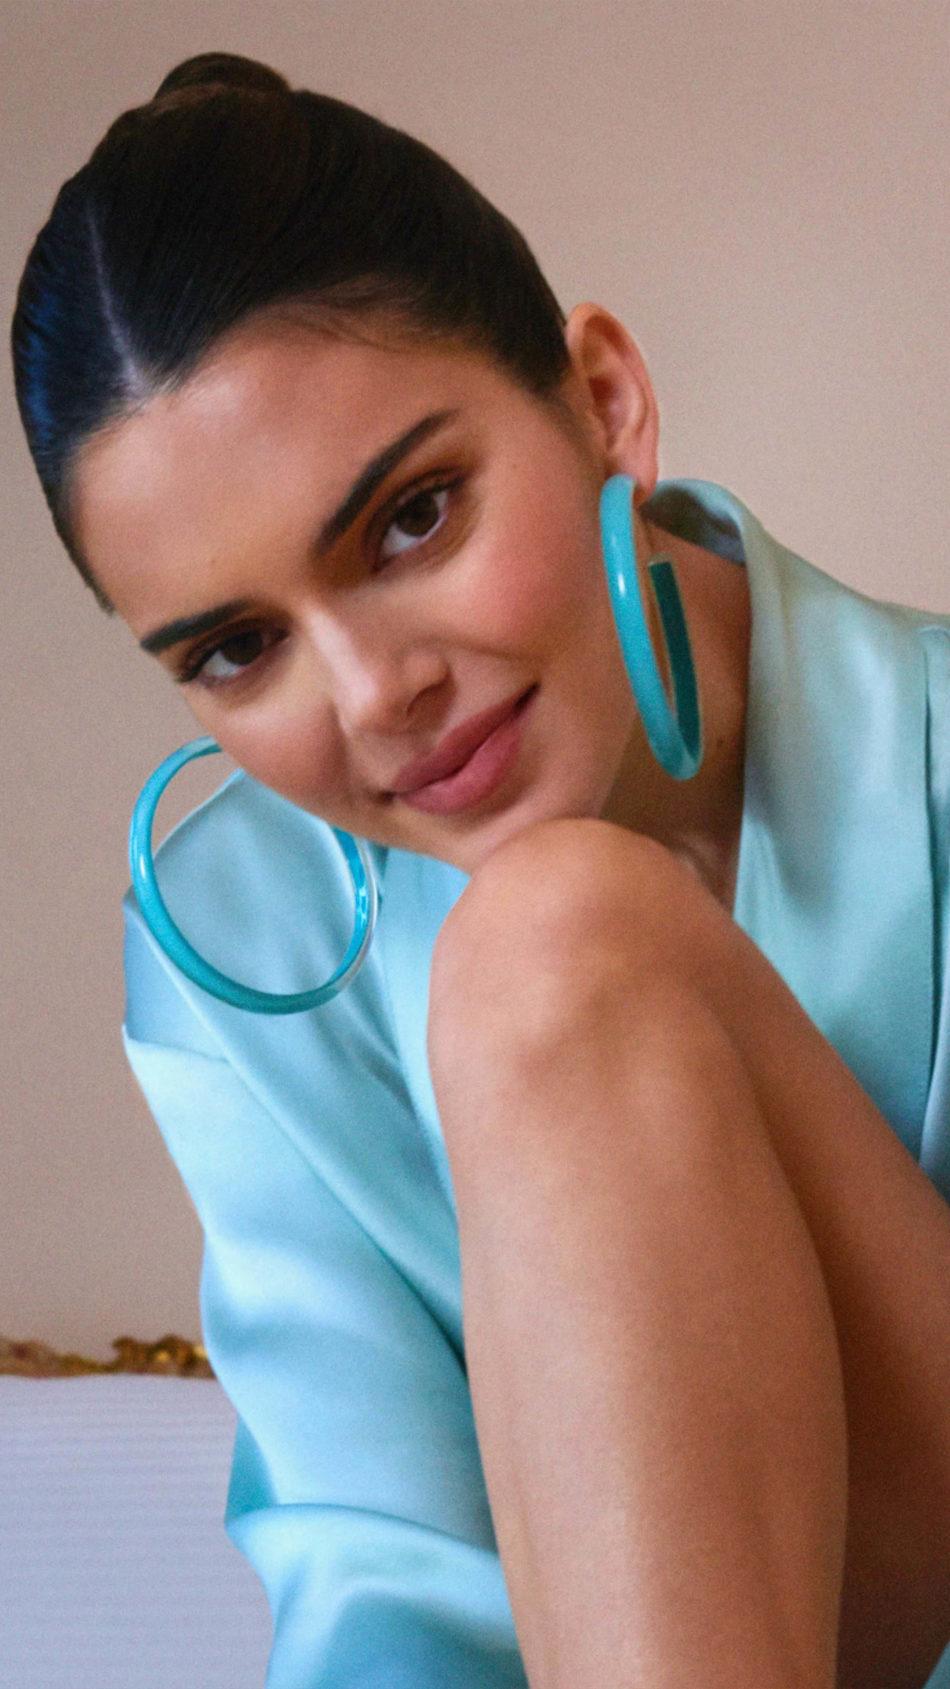 Kendall Jenner In Blue Dress 4K Ultra HD Mobile Wallpaper